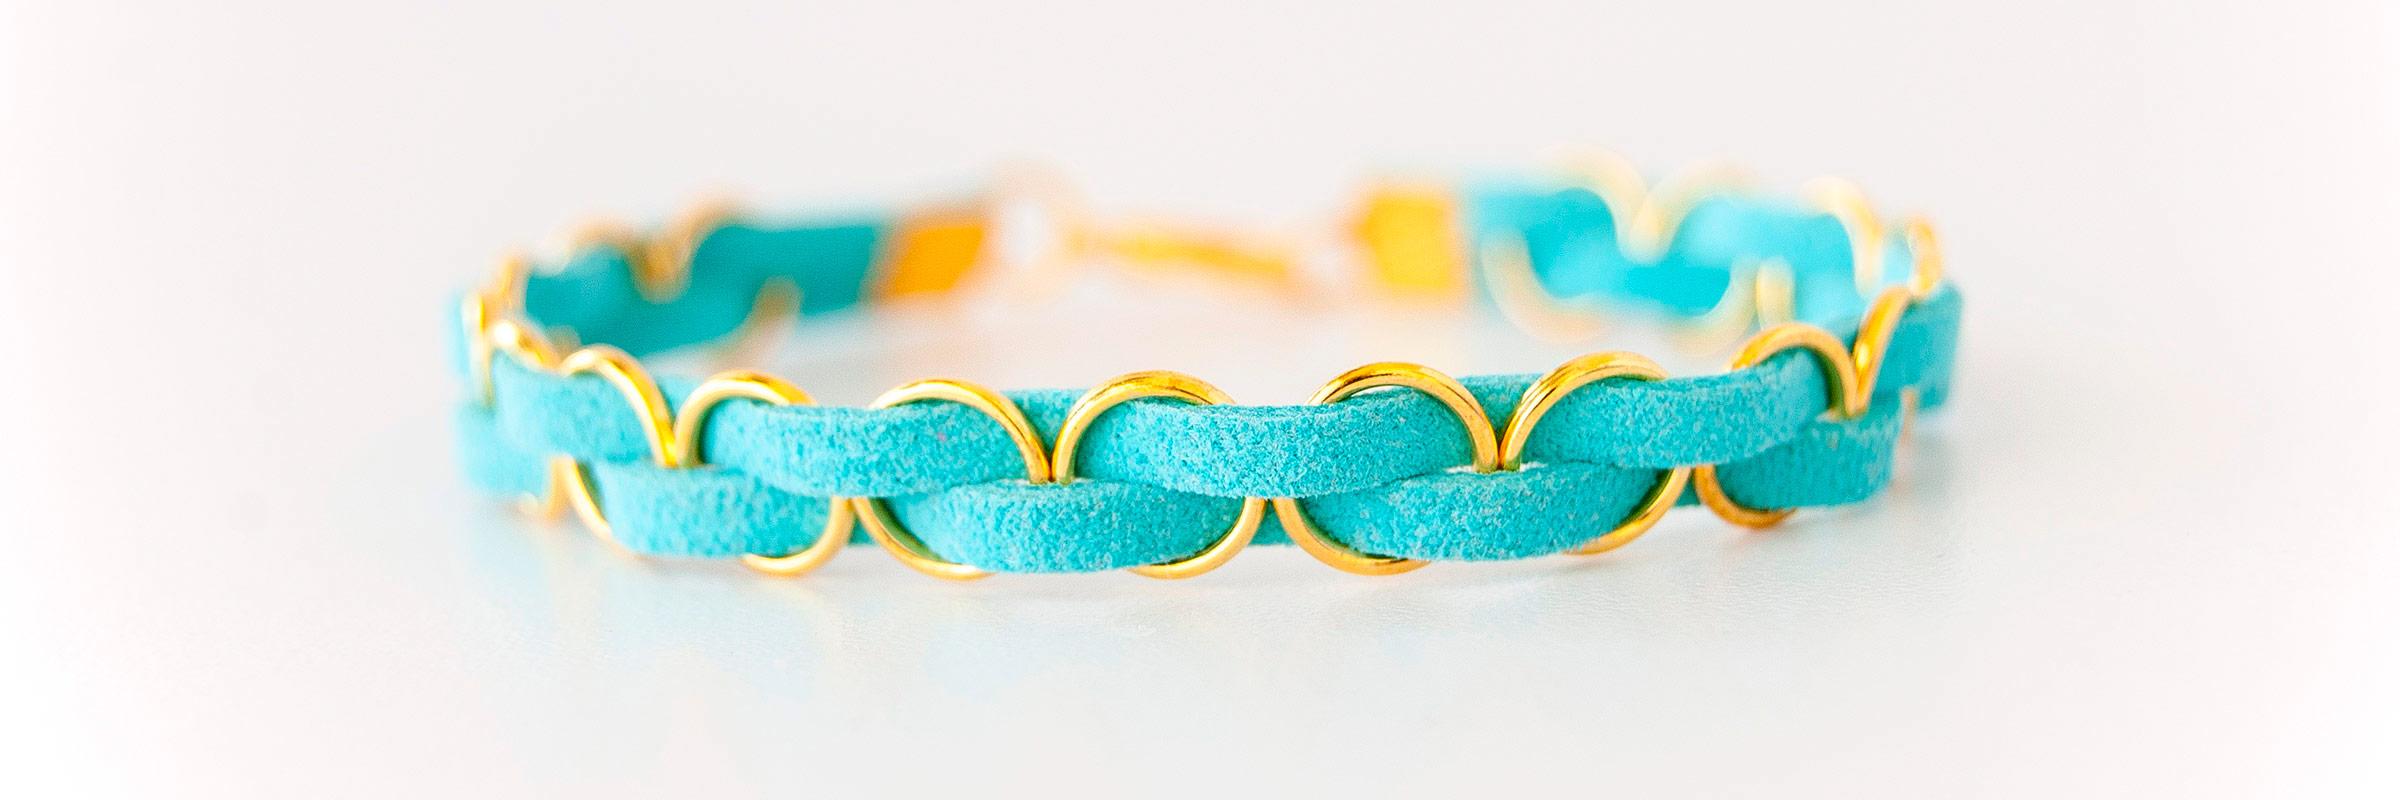 Crafty Jewelry Making